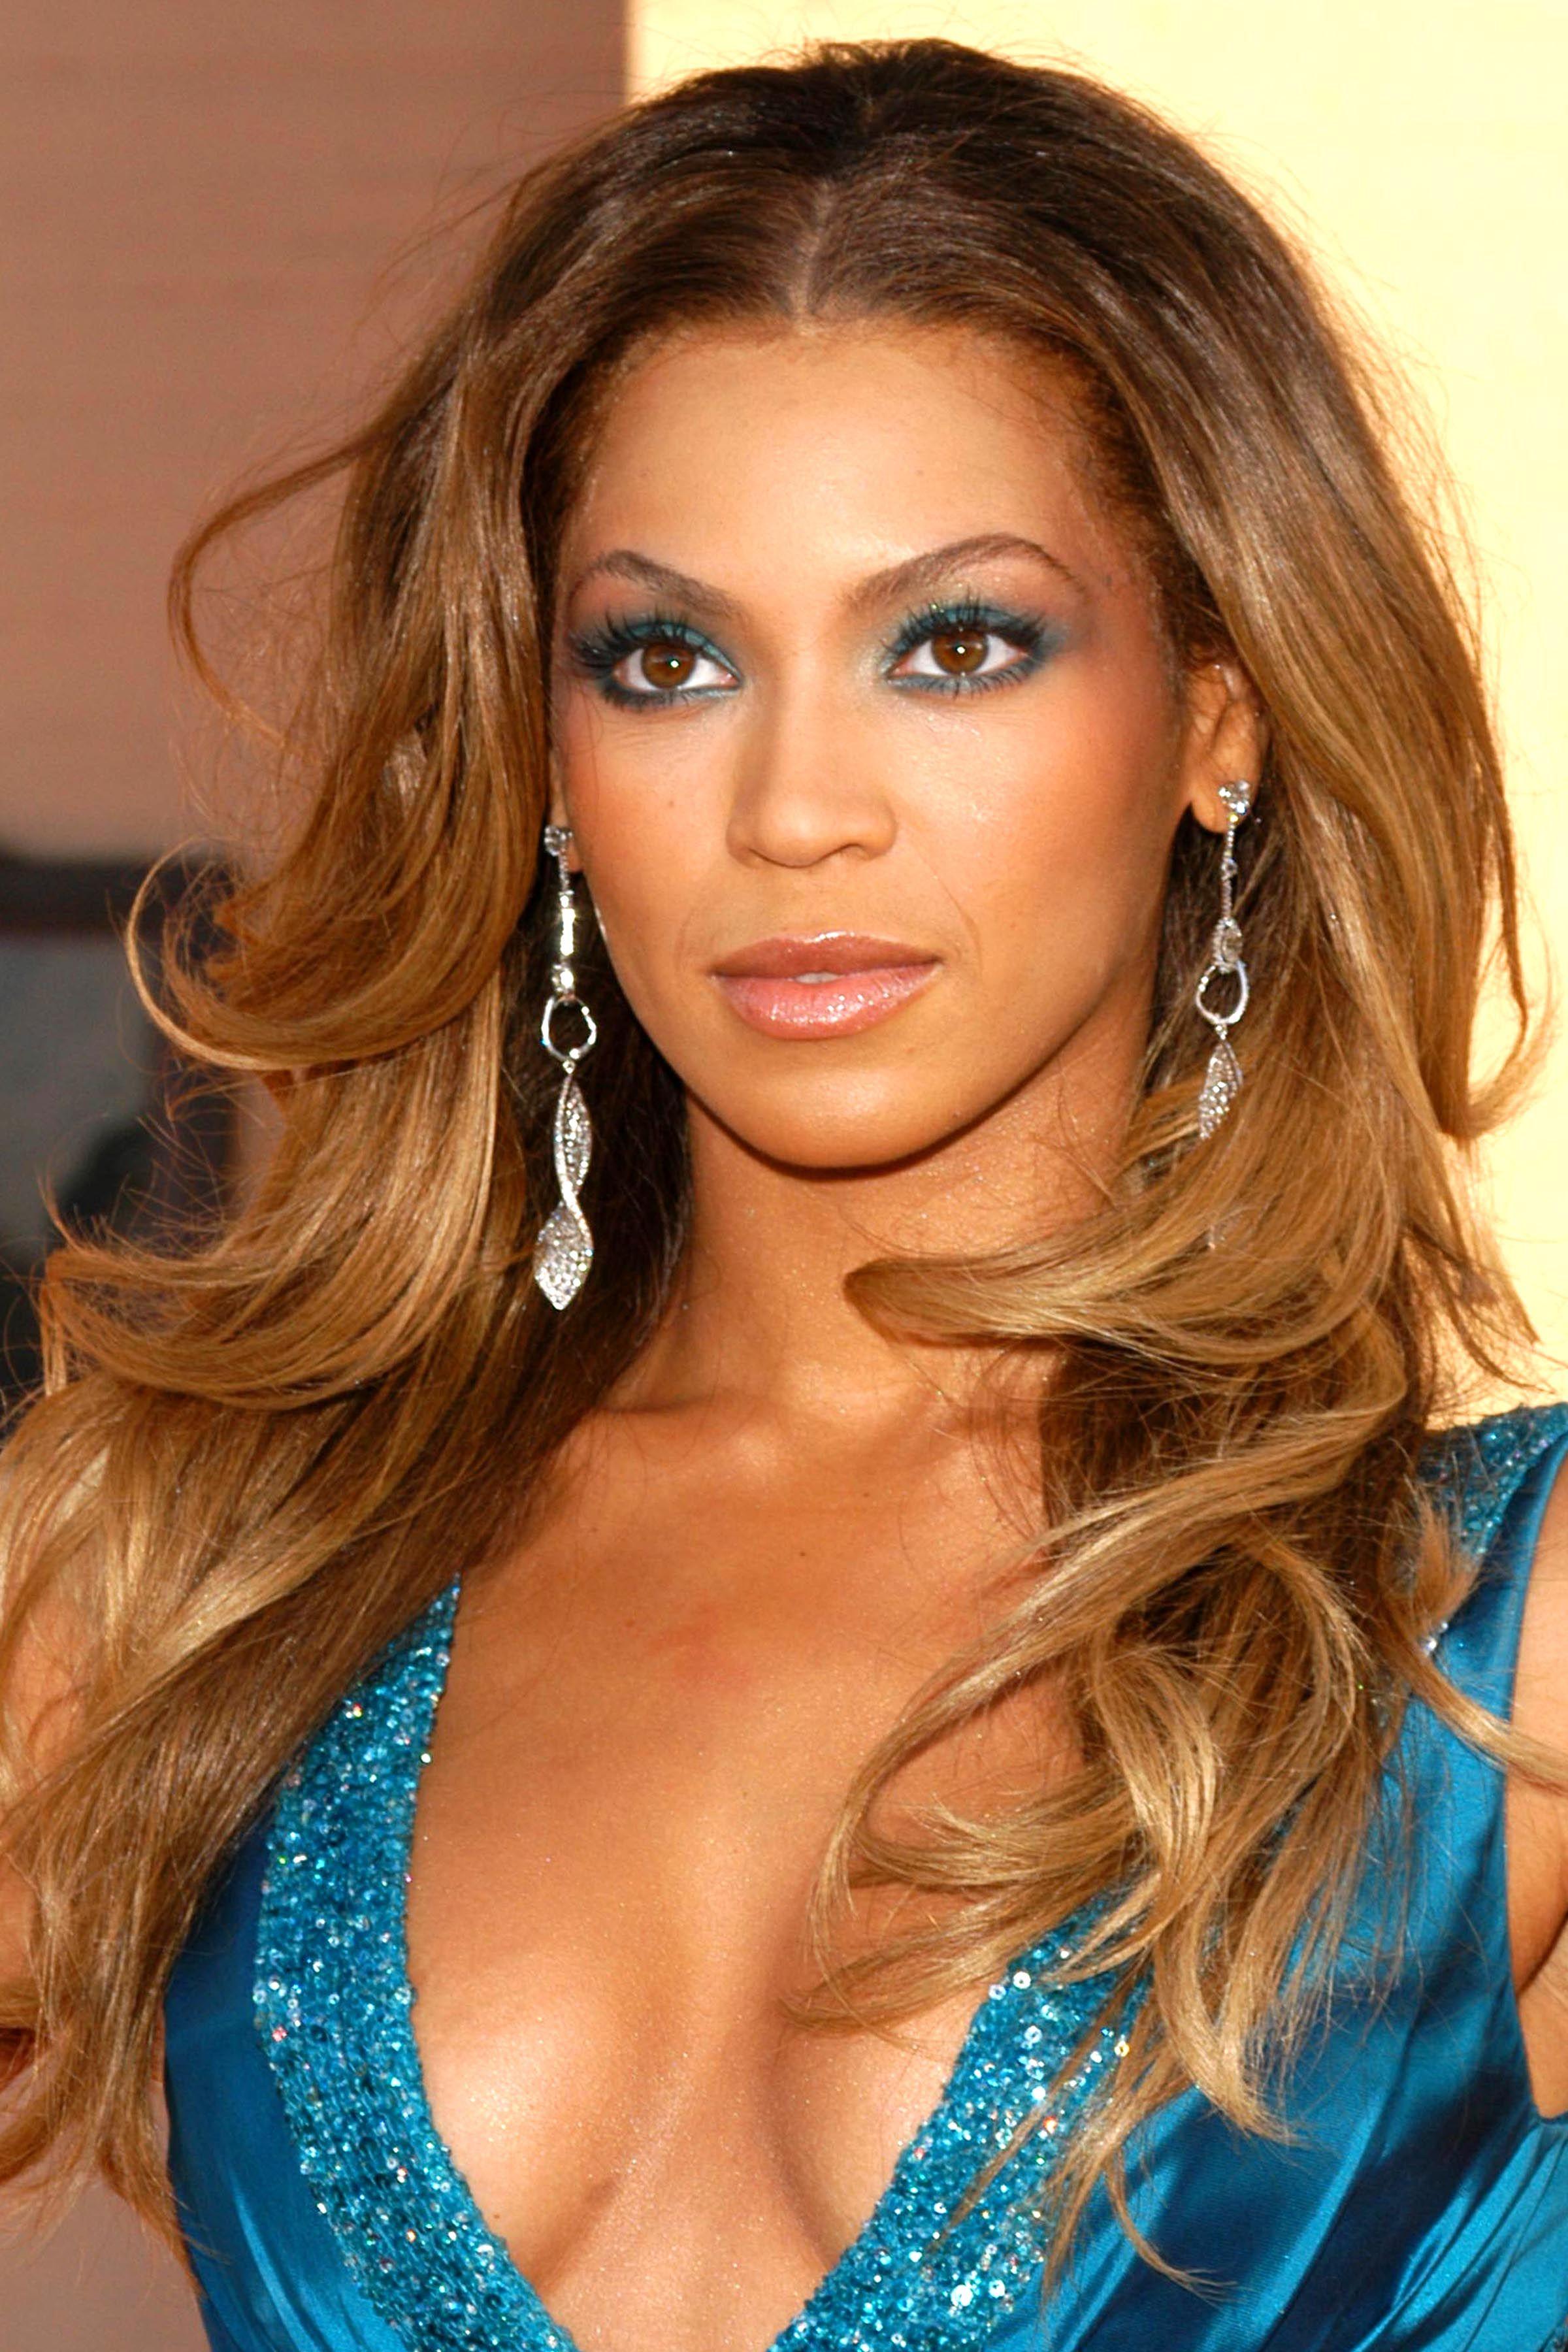 Groovy 80 Best Beyonce Hairstyles Of All Time Beyonces Evolving Hair Looks Schematic Wiring Diagrams Phreekkolirunnerswayorg